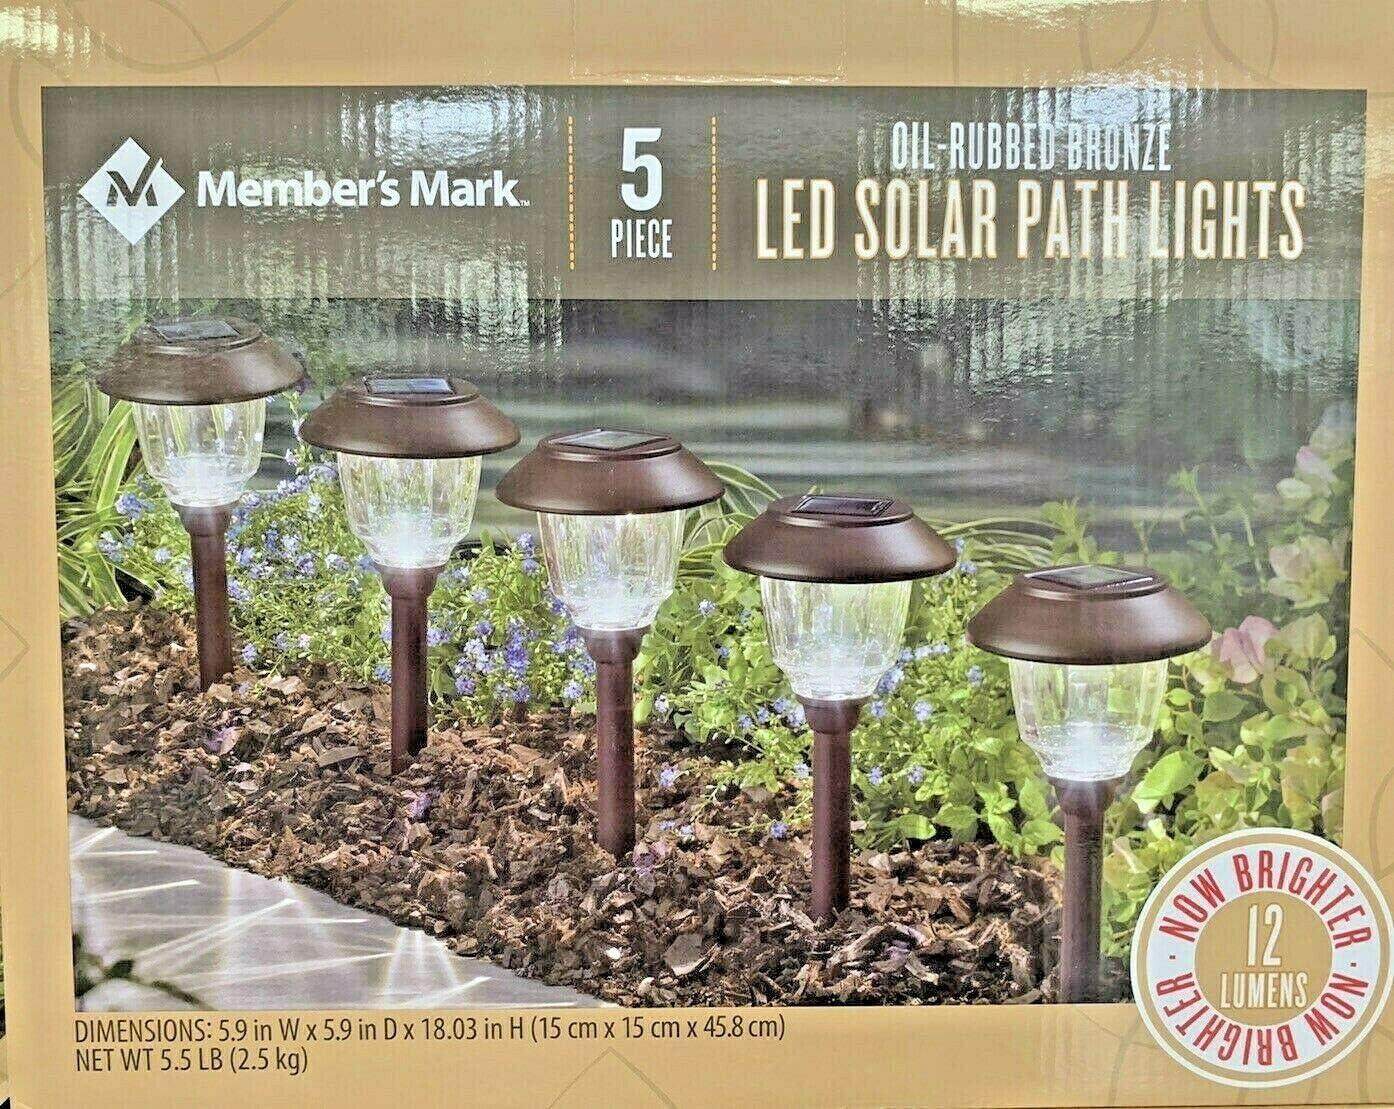 Member s Mark 5-Piece Oil-Rubbed Bronze Led Solar Path Lights